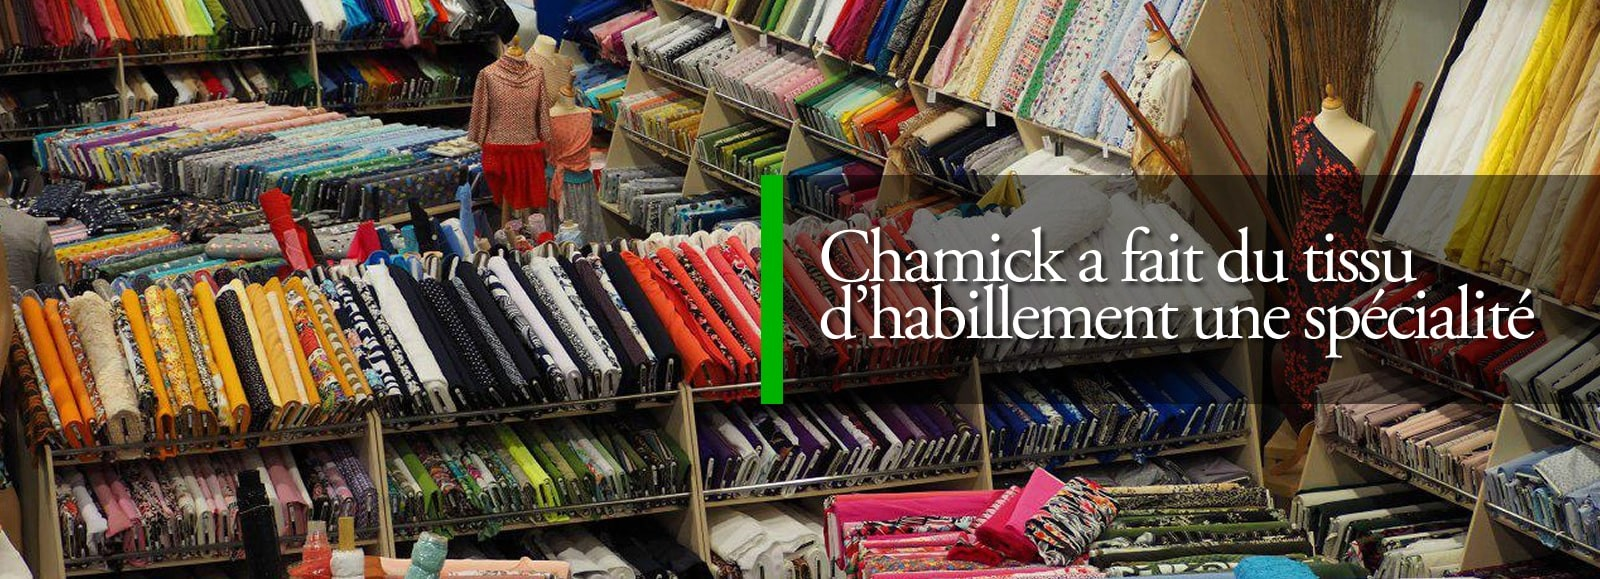 Habillement Chamick